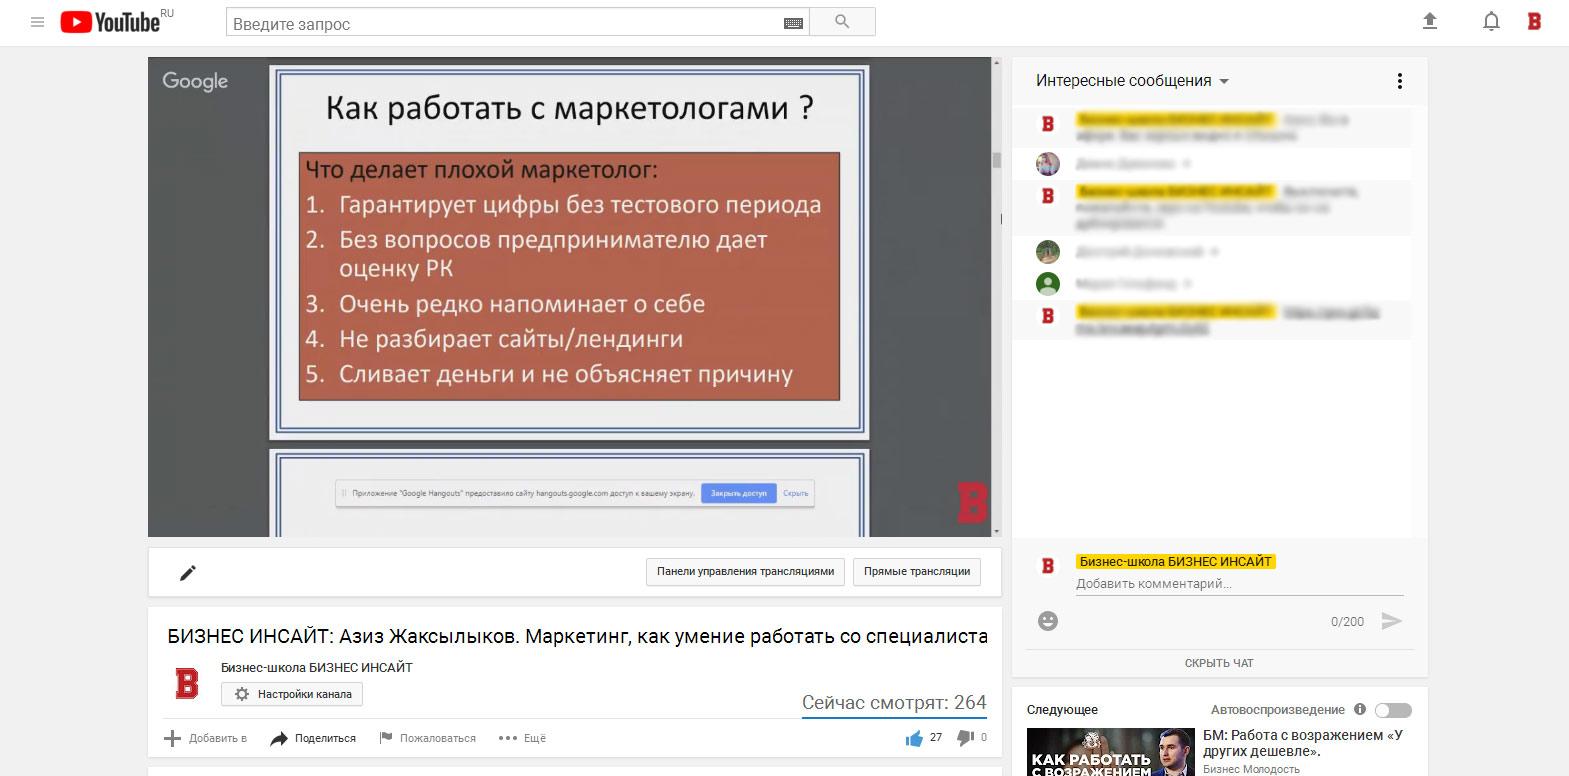 Азиз Жаксылыков провел открытый вебинар на площадке БИЗНЕС ИНСАЙТ